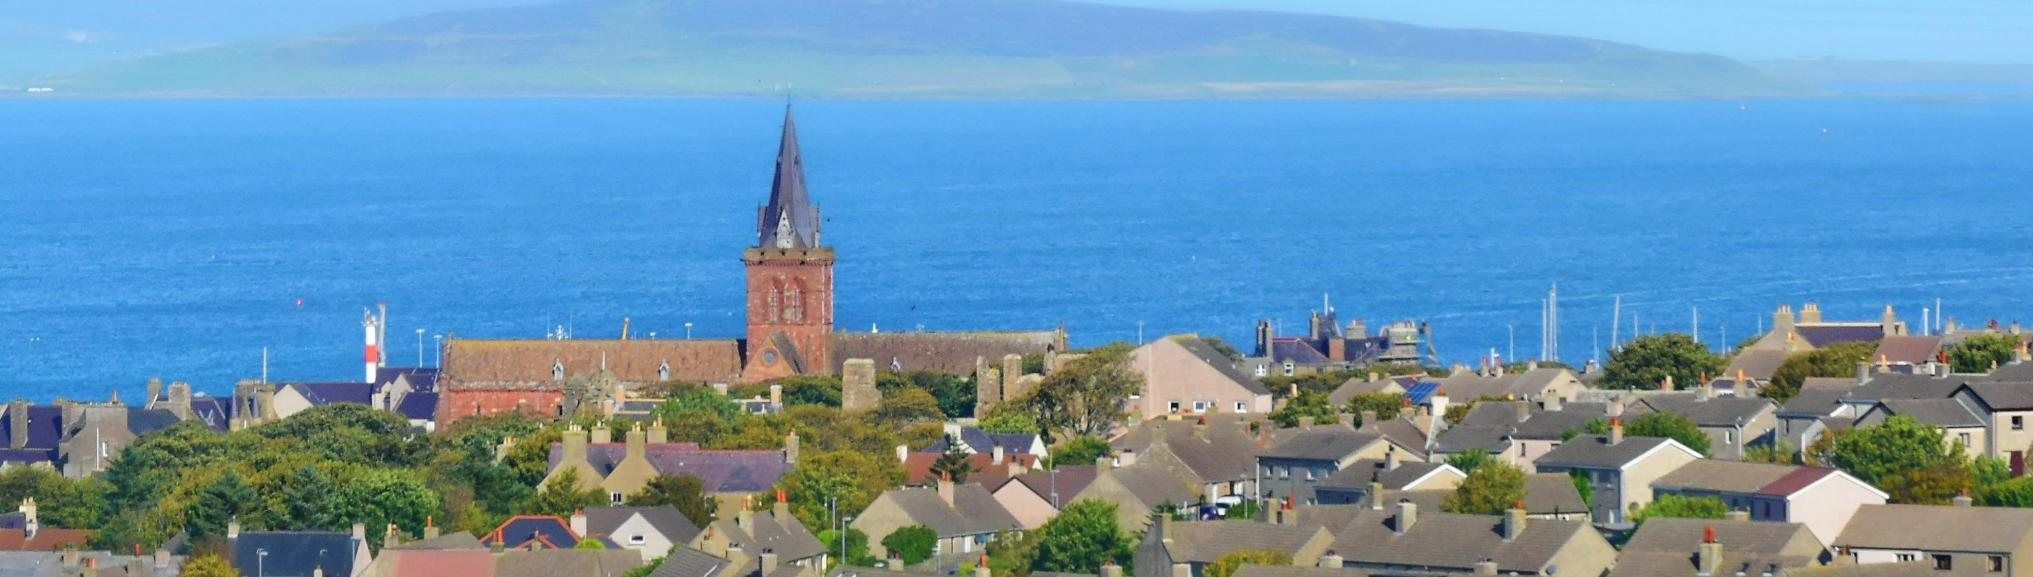 Lanschap Kirkwall, Orkney